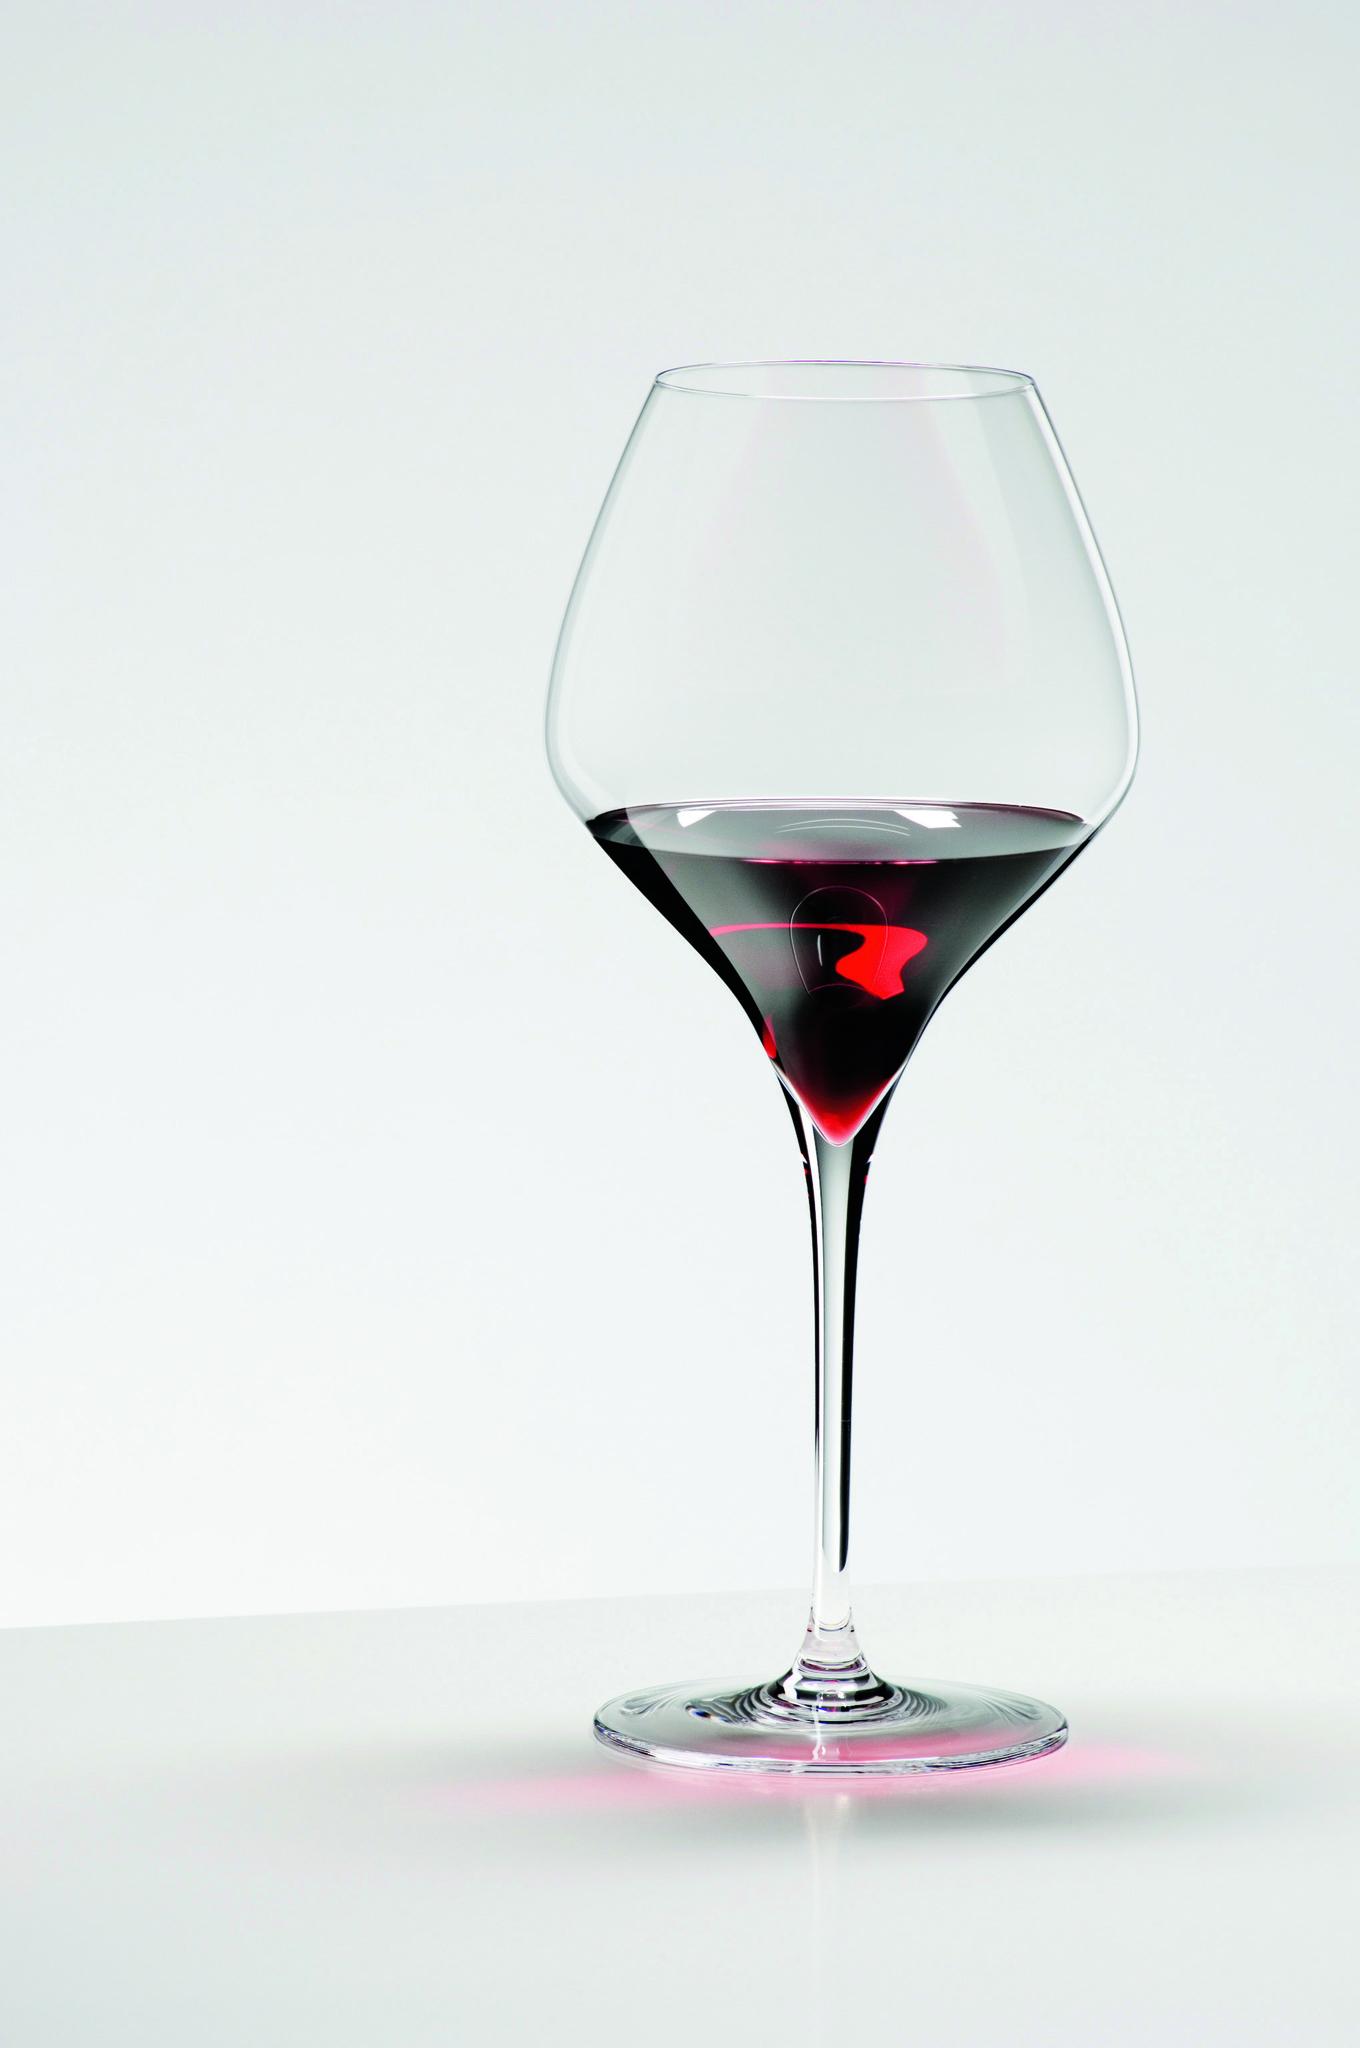 Бокалы Набор бокалов для красного вина 2шт 770мл Riedel Vitis Pinot Noir nabor-bokalov-dlya-krasnogo-vina-2-sht-770-ml-riedel-pinot-noir-avstriya.jpg